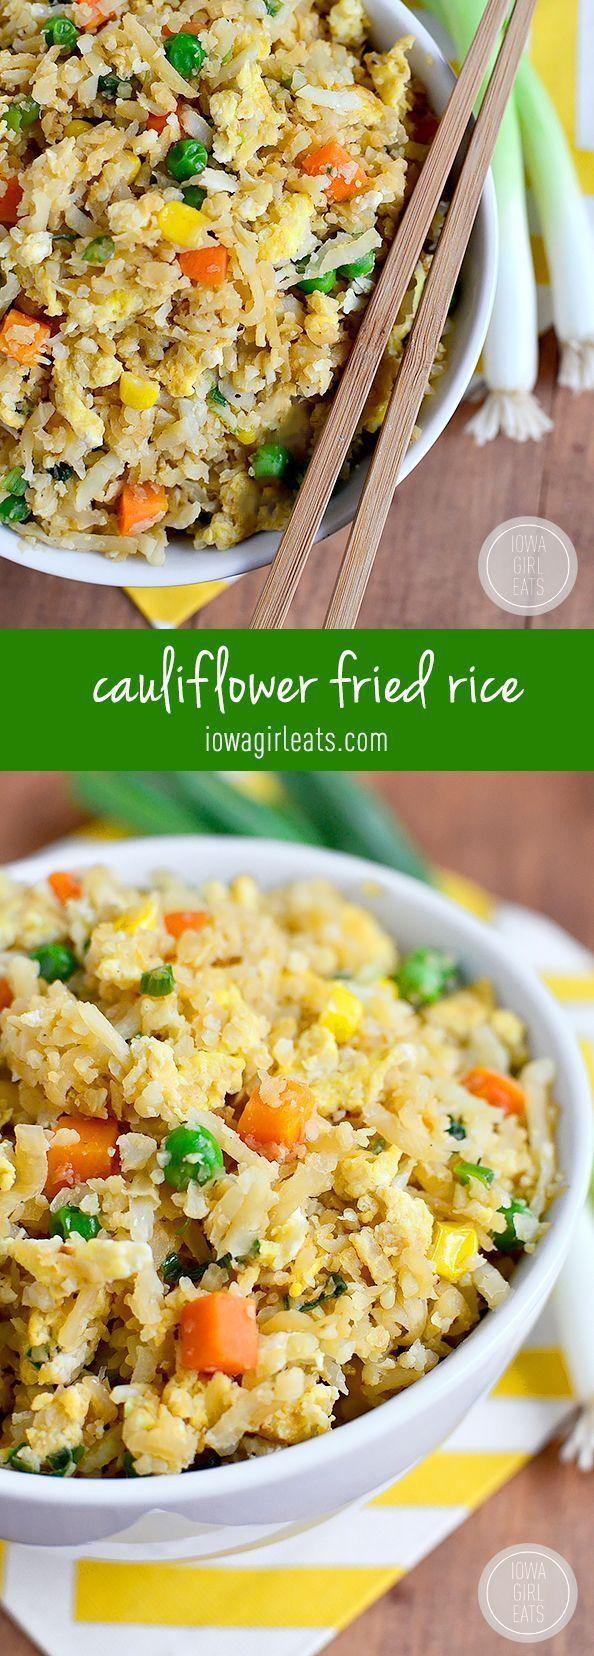 Cauliflower Fried Rice (Video) – Iowa Girl Eats